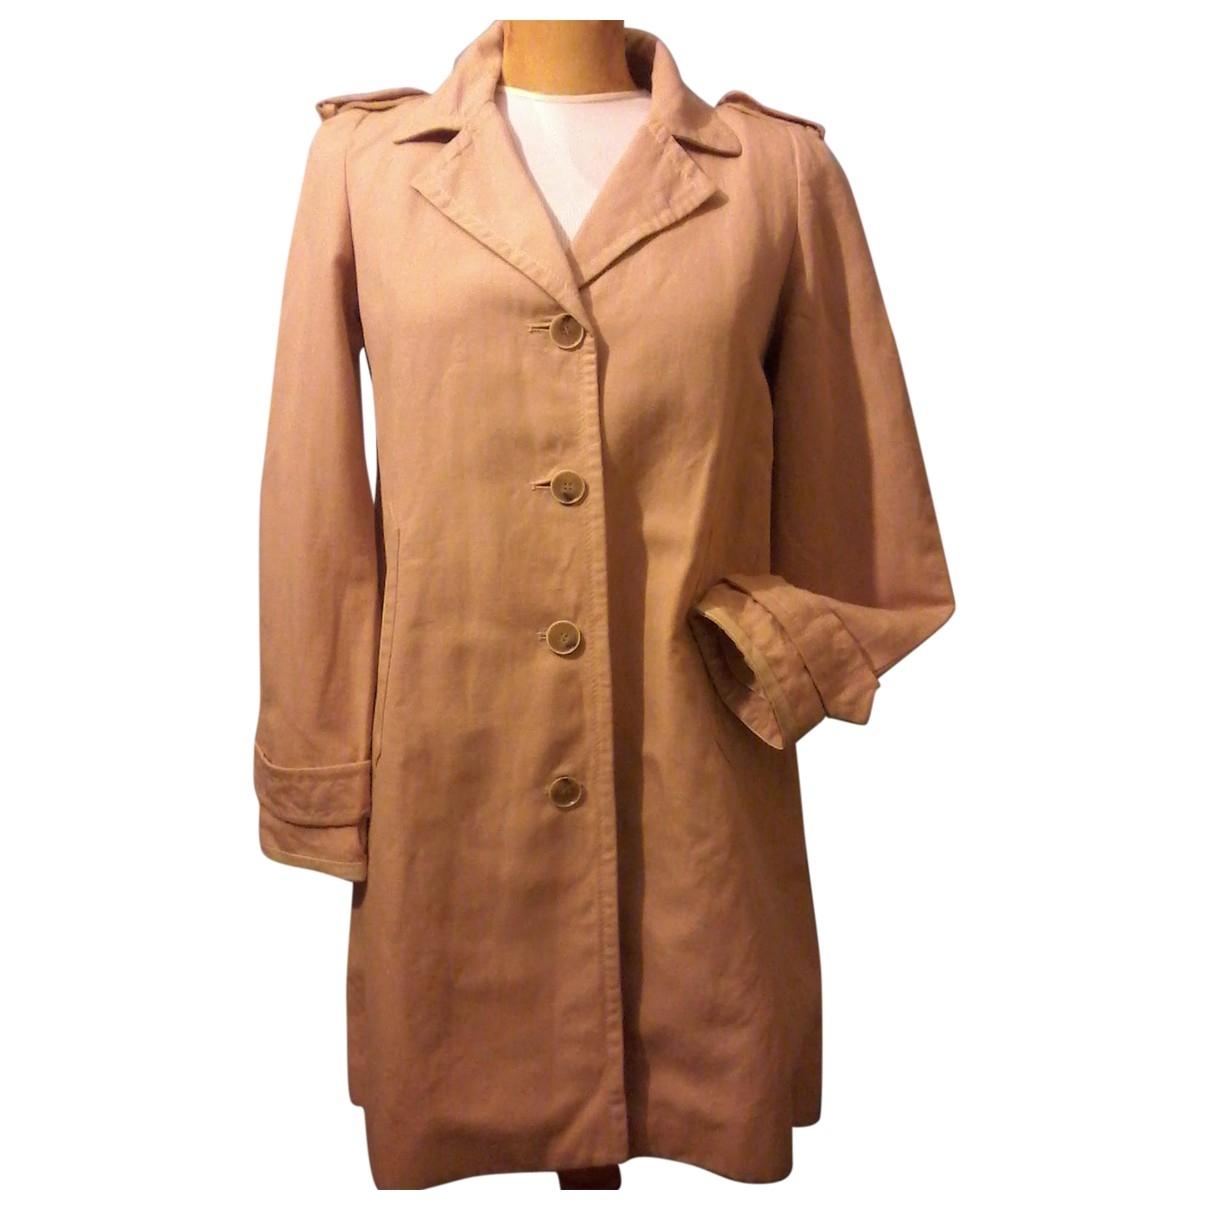 Claudie Pierlot \N Beige Cotton jacket for Women 38 FR